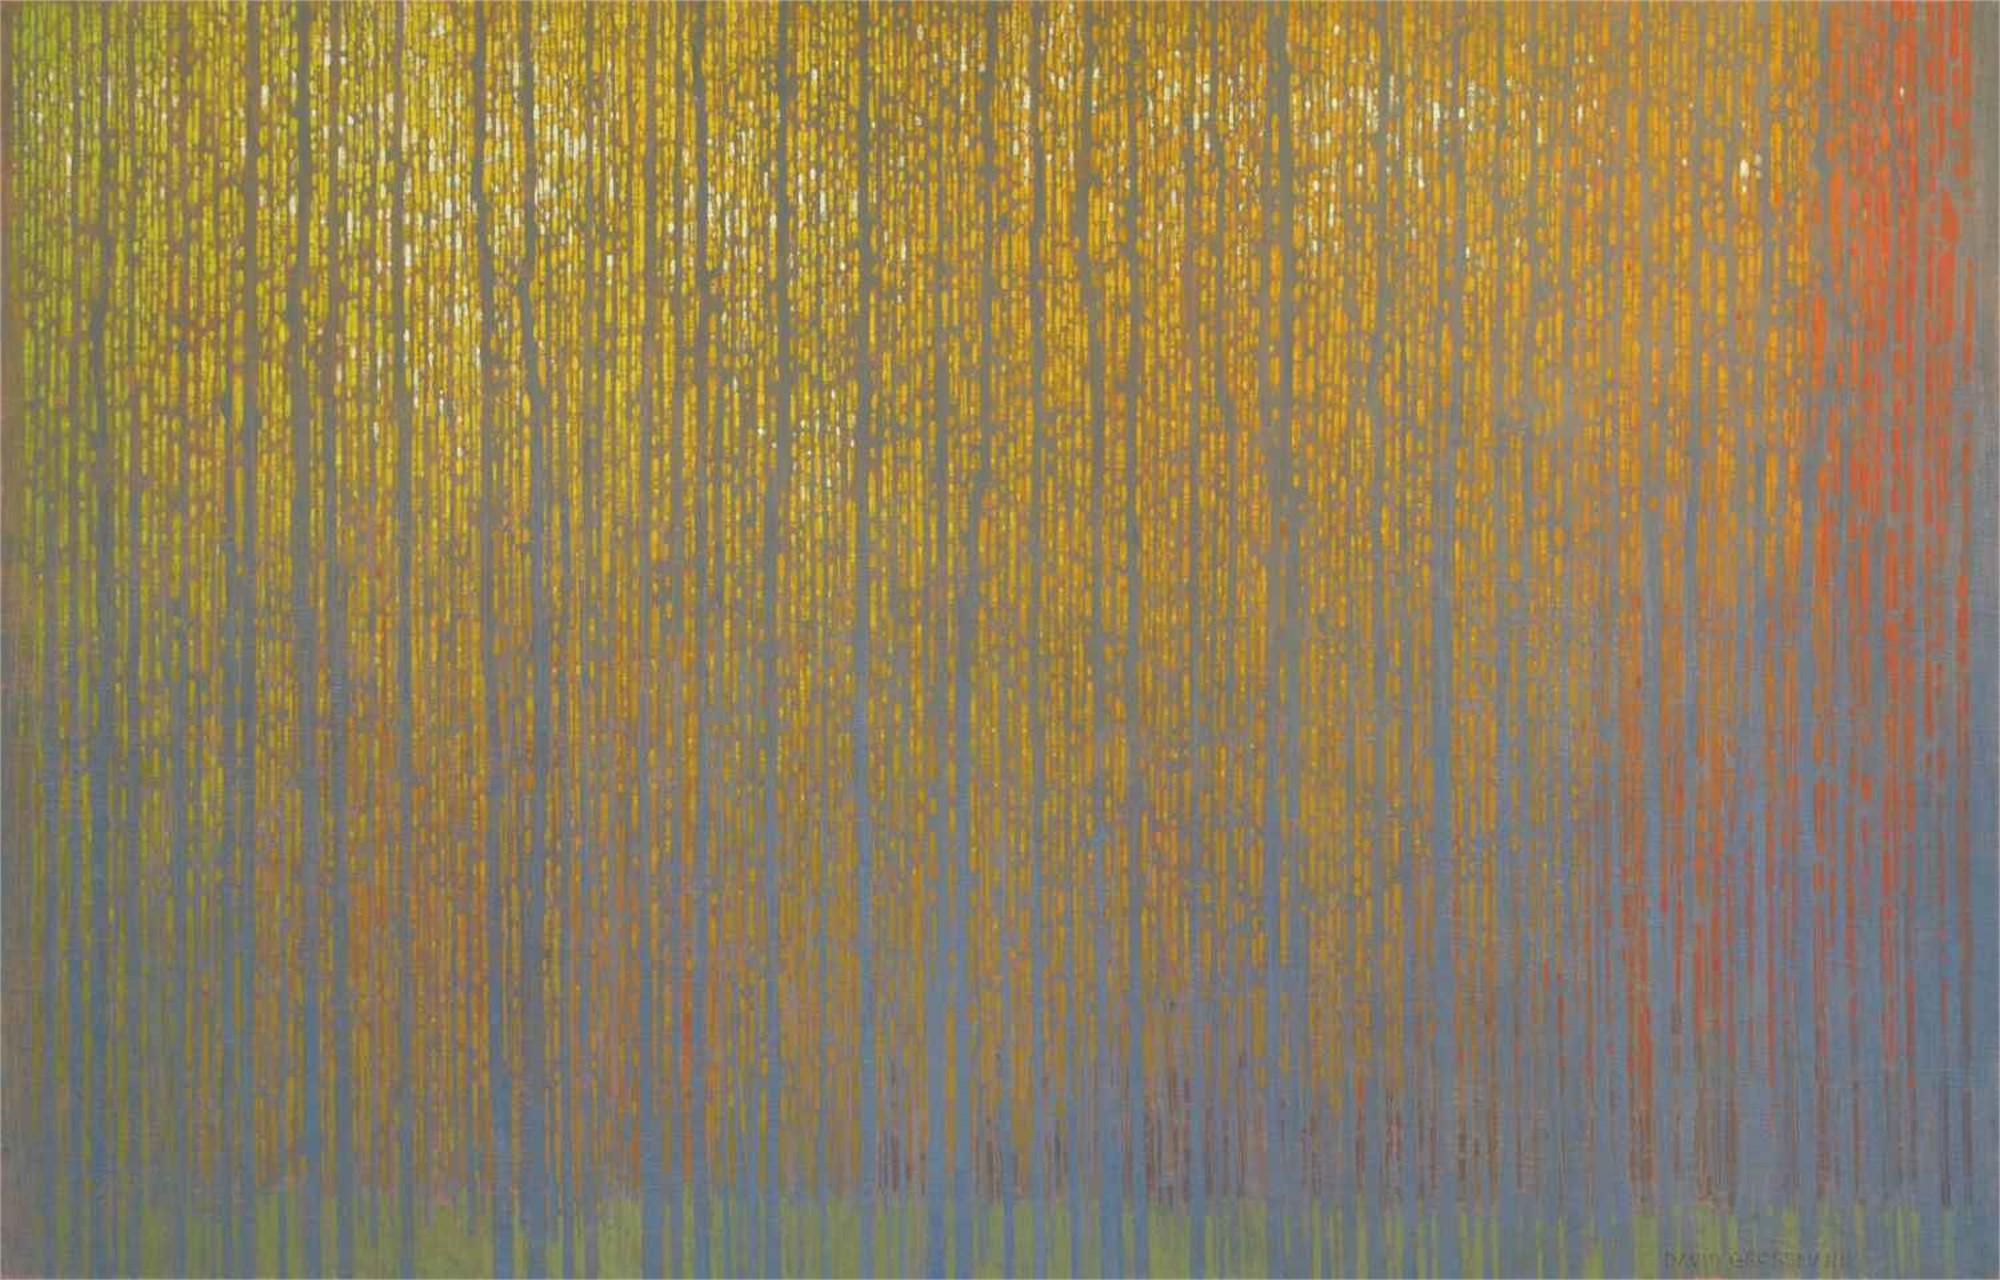 Autumn Color Patterns by David Grossmann